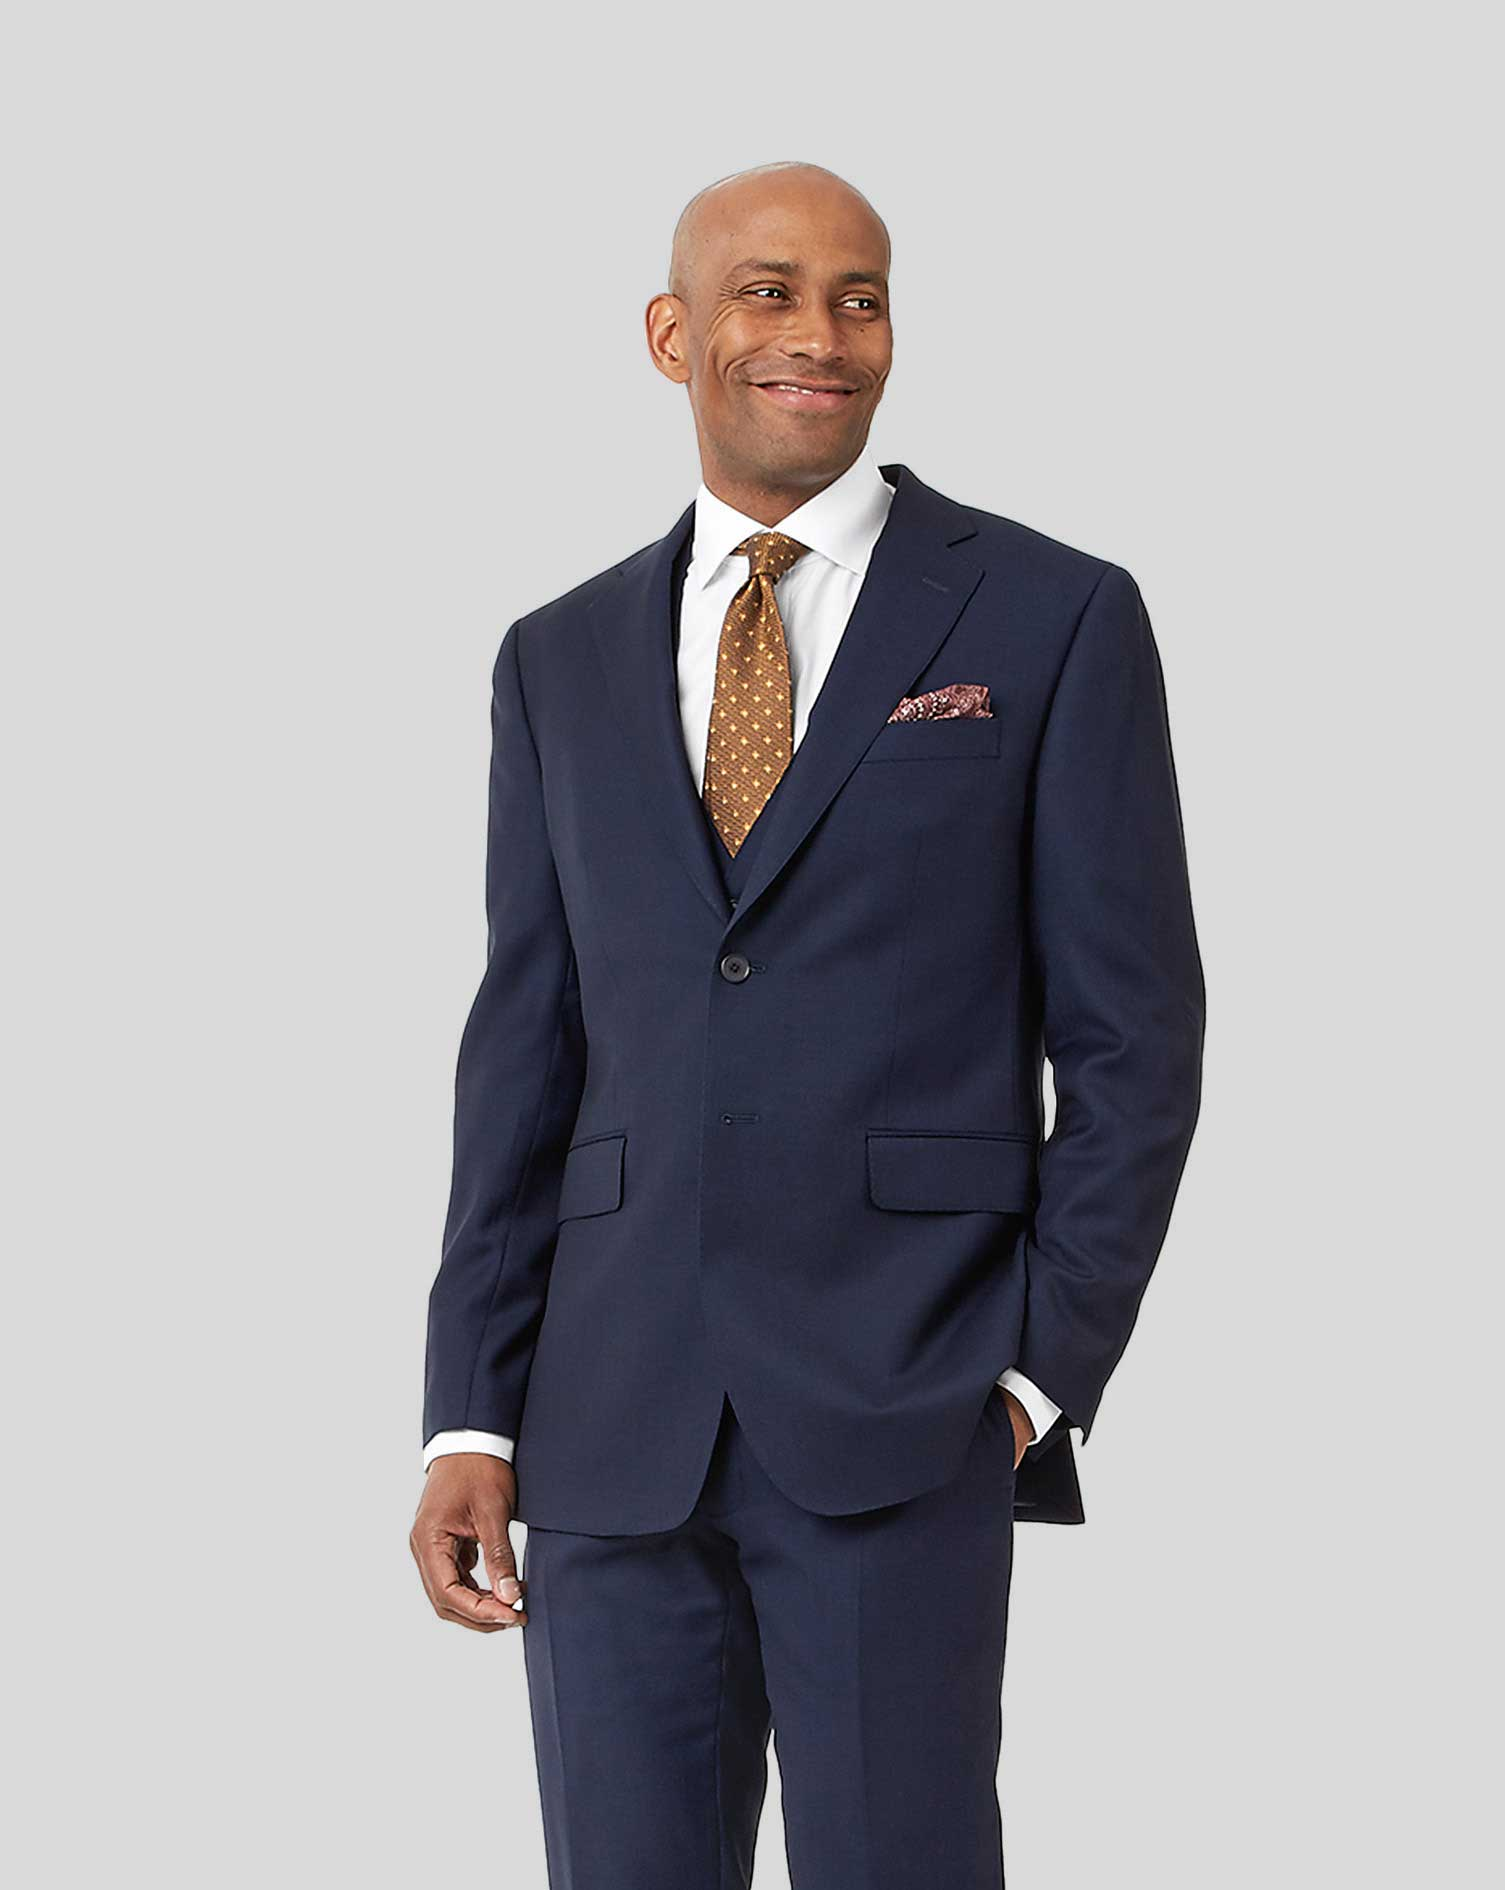 Image of Charles Tyrwhitt Birdseye Travel Suit Wool Jacket - Ink Blue Size 36R Regular by Charles Tyrwhitt